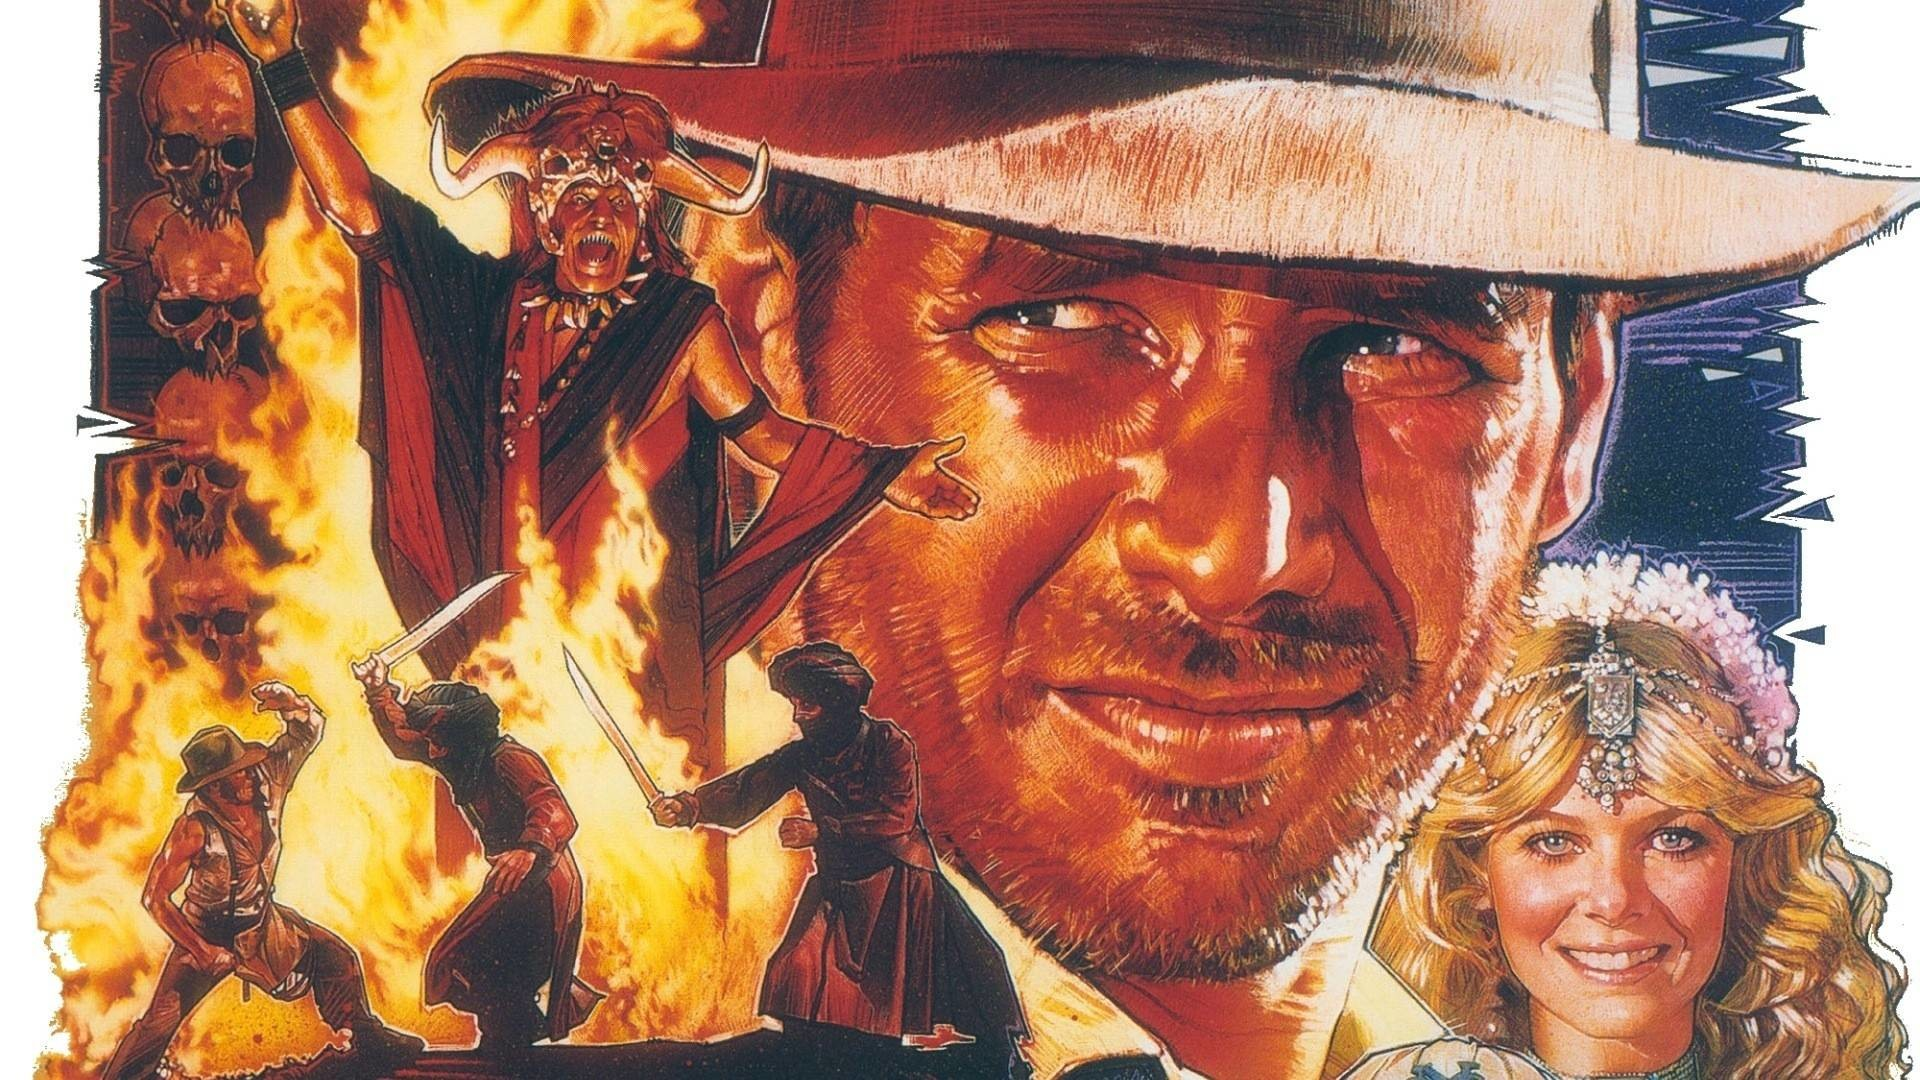 Shauncastic 251: Indiana Jones and the Temple of Doom Commentgeeking